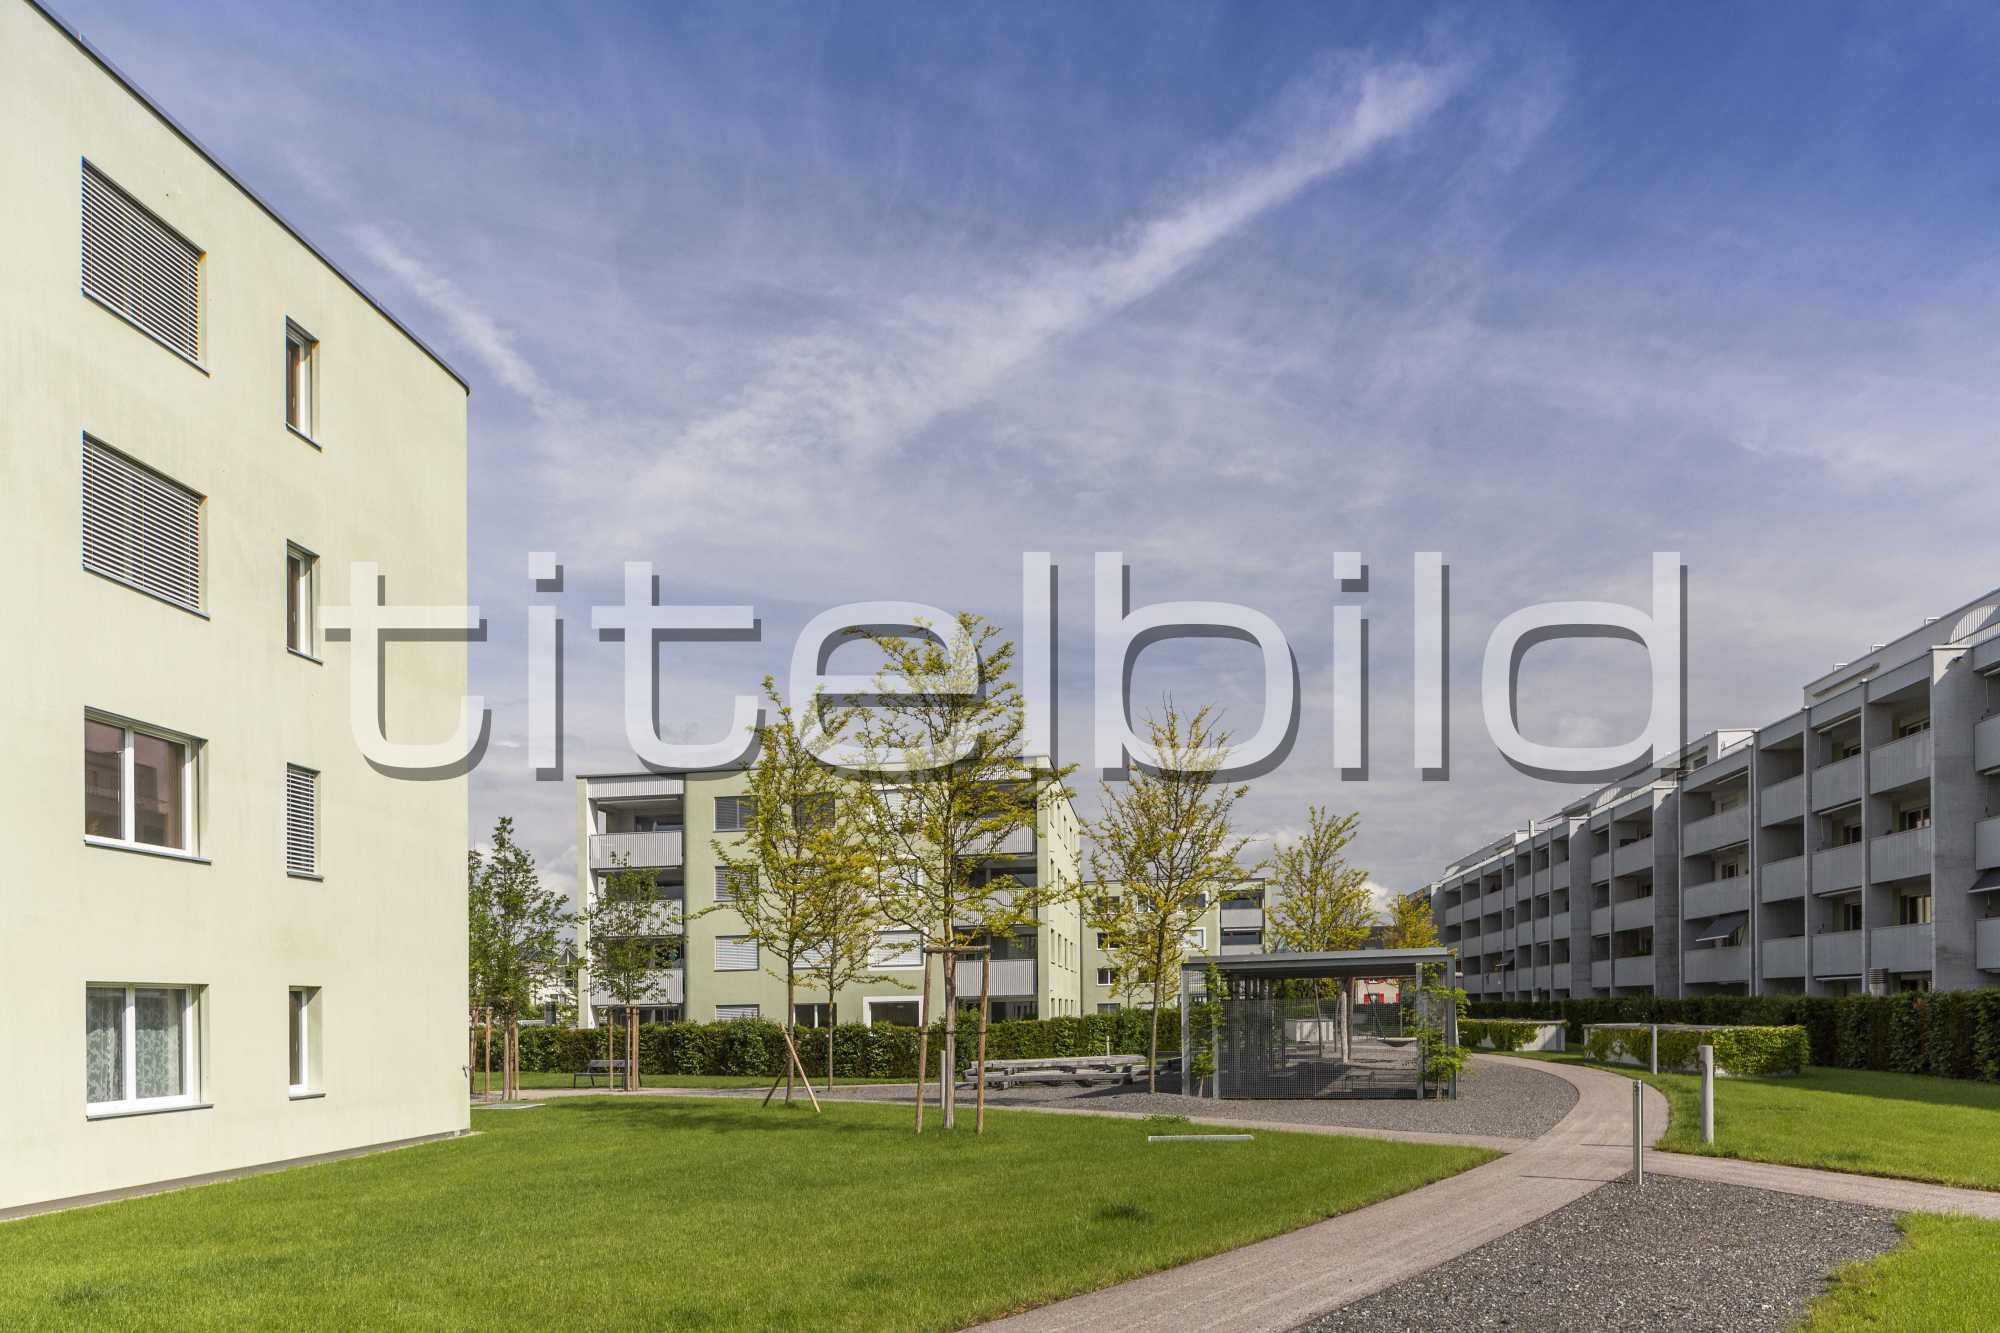 Projektbild-Nr. 2: Parksiedlung Wiggerweg